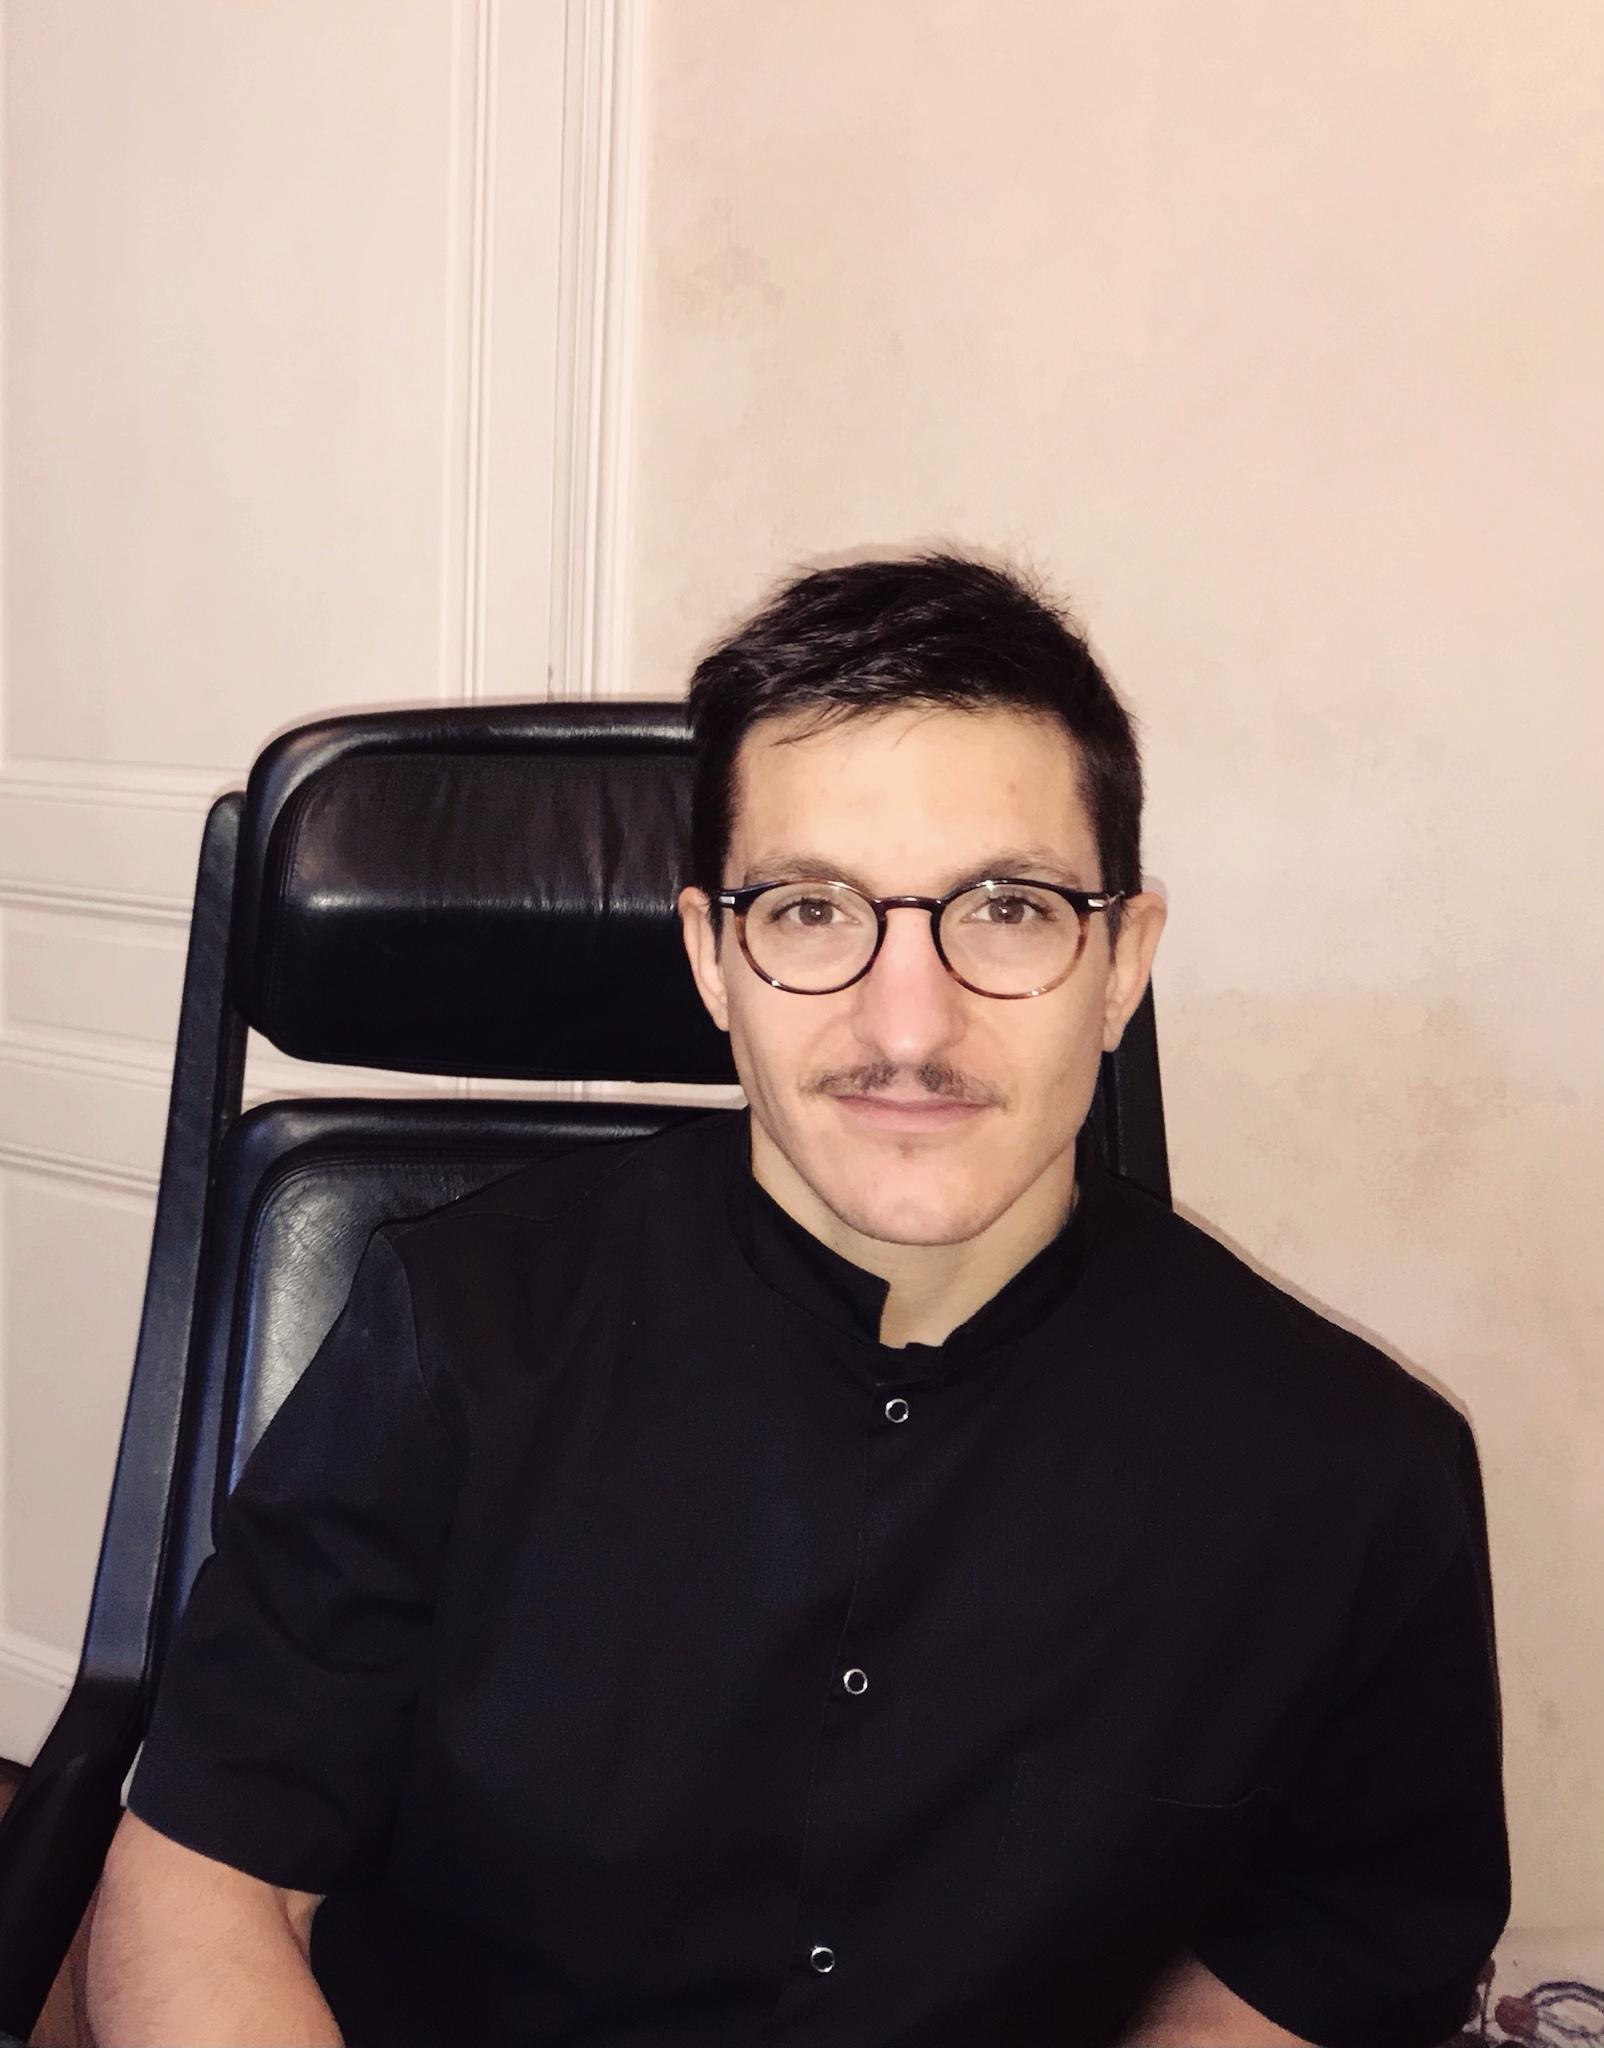 DARBAS Benoît